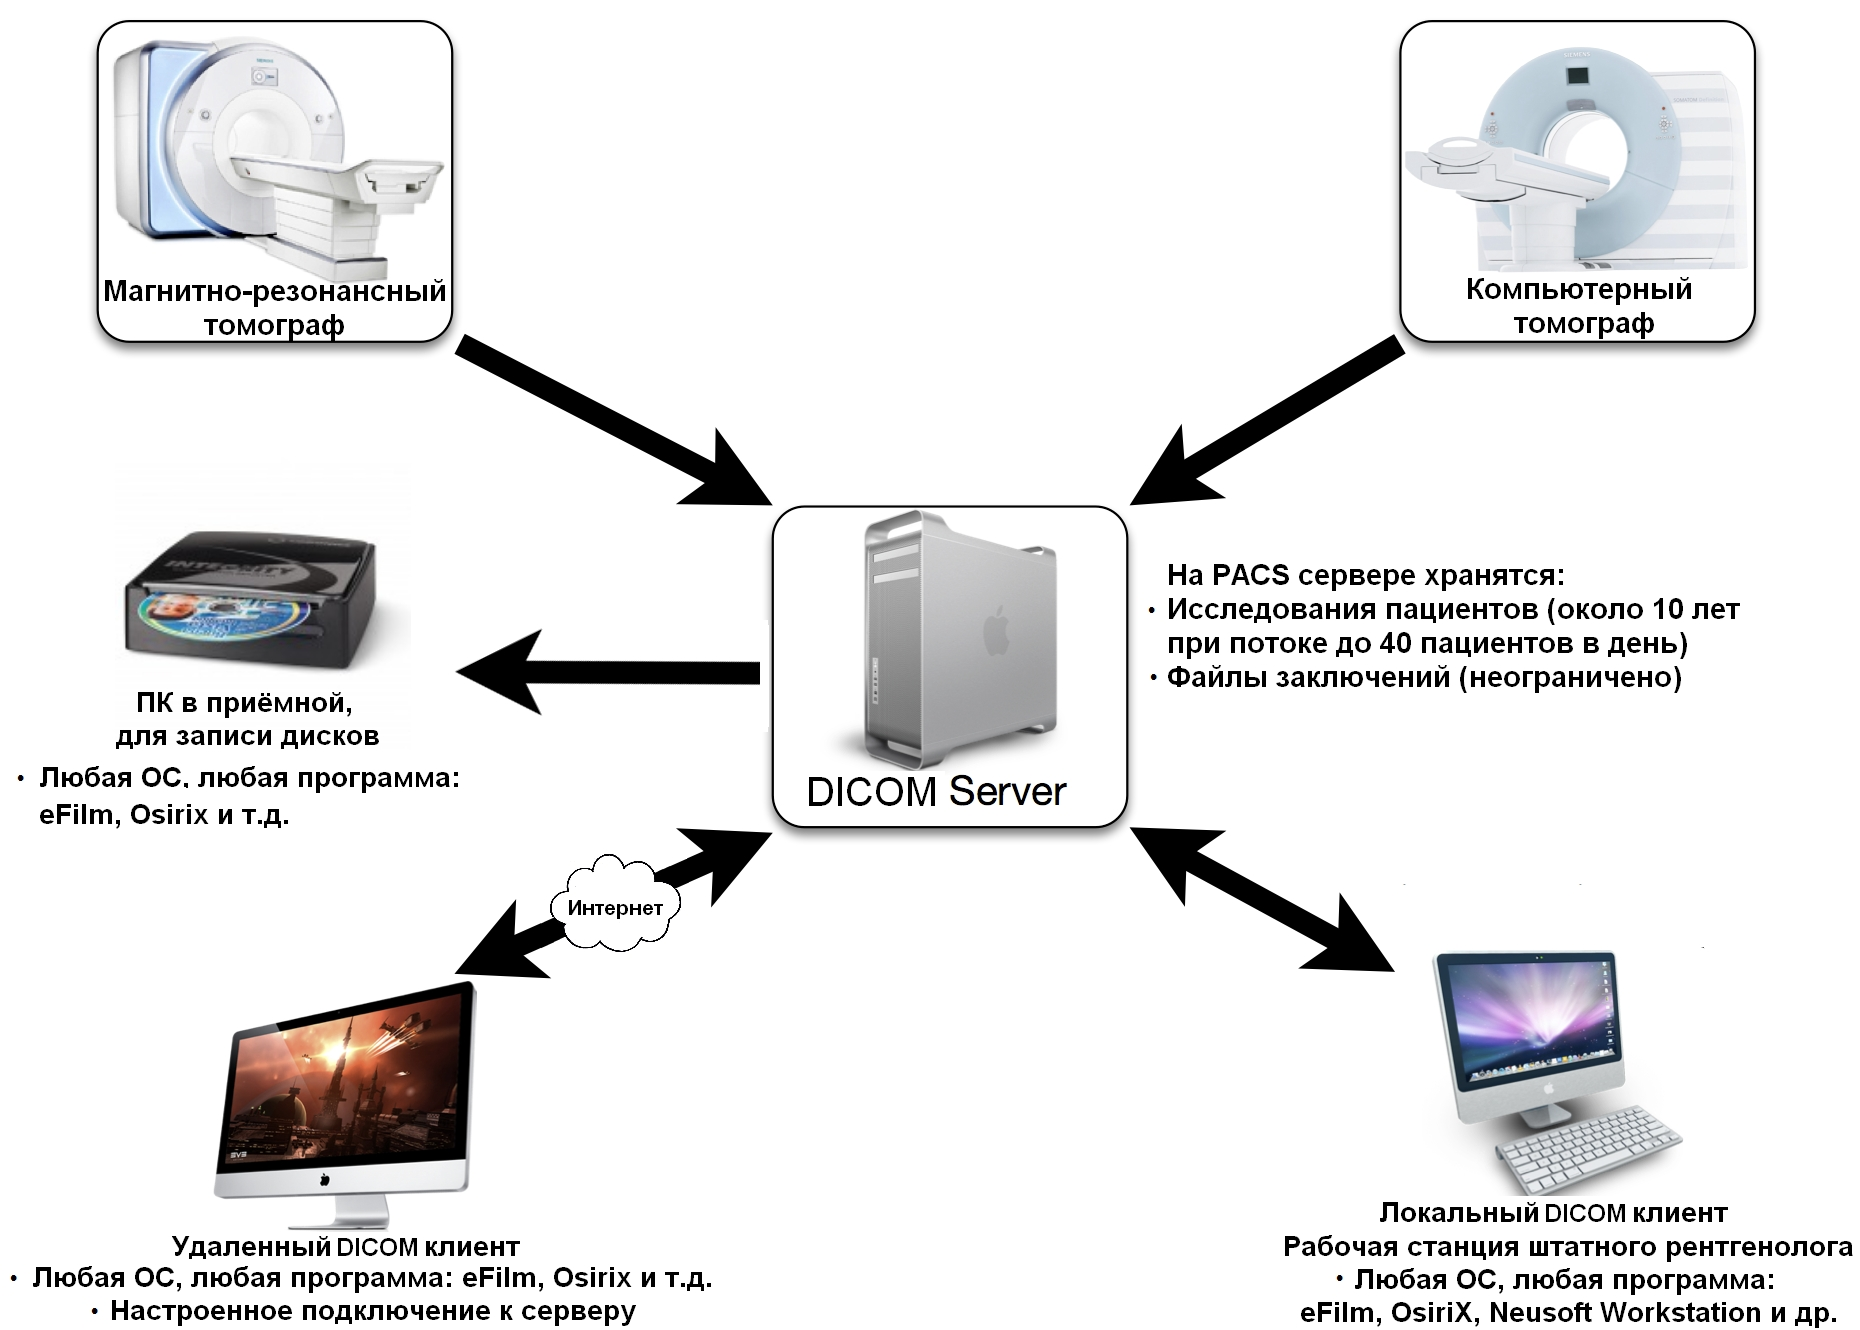 Схема DICOM системы